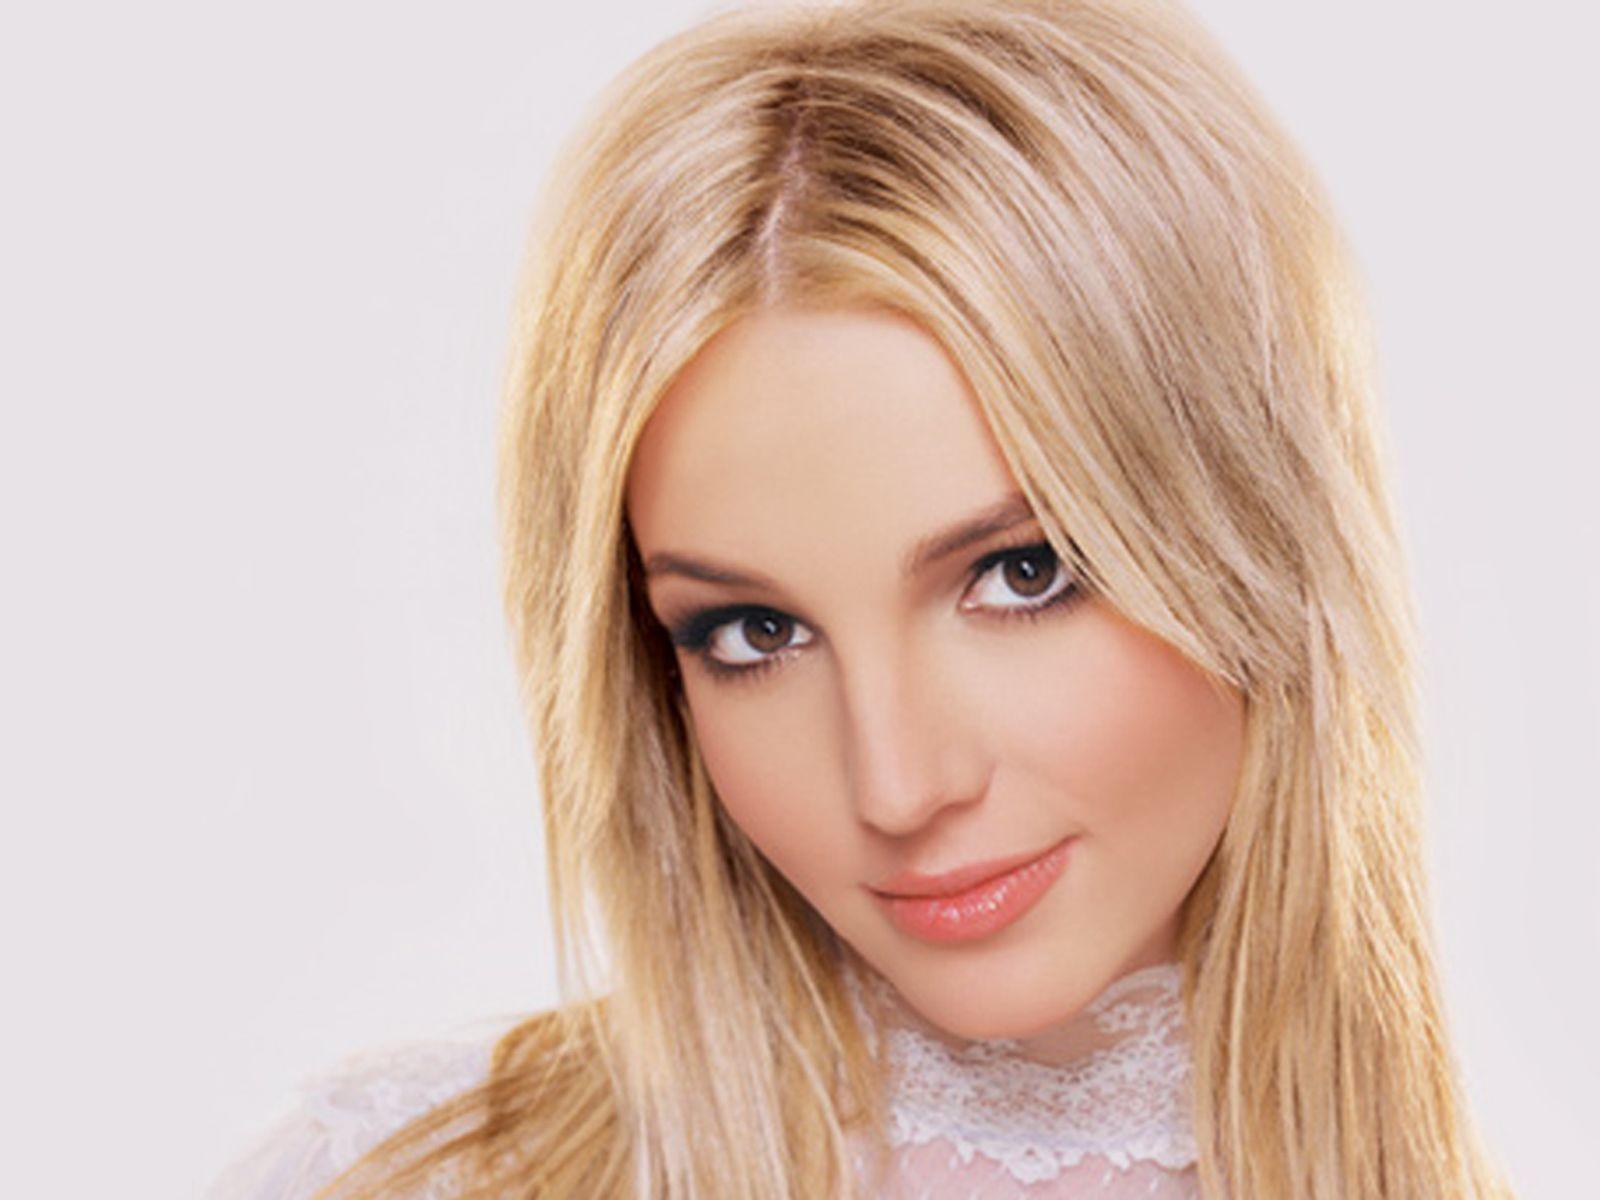 Britney Spears - Everytime [Lyrics]